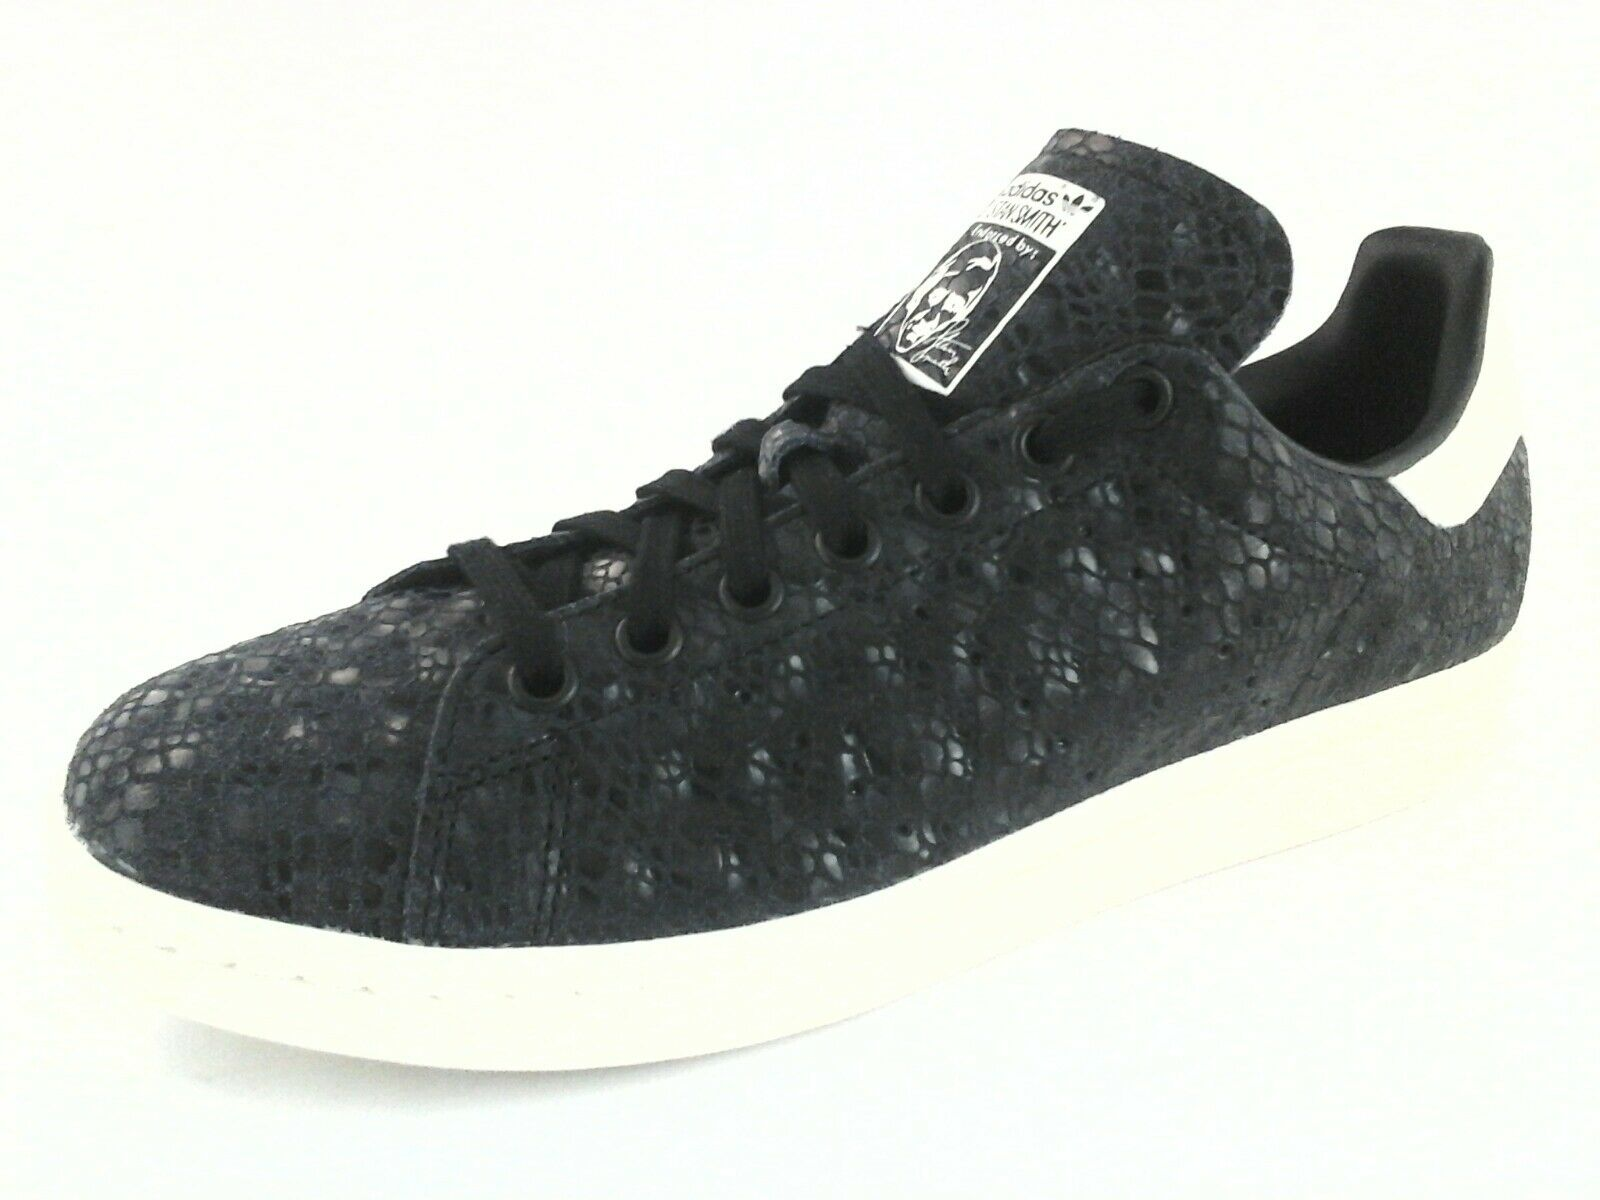 Adidas stan smith le donne scarpe s77344 nero / snake embcuoio noi 8,5 / nero 3 8722f9